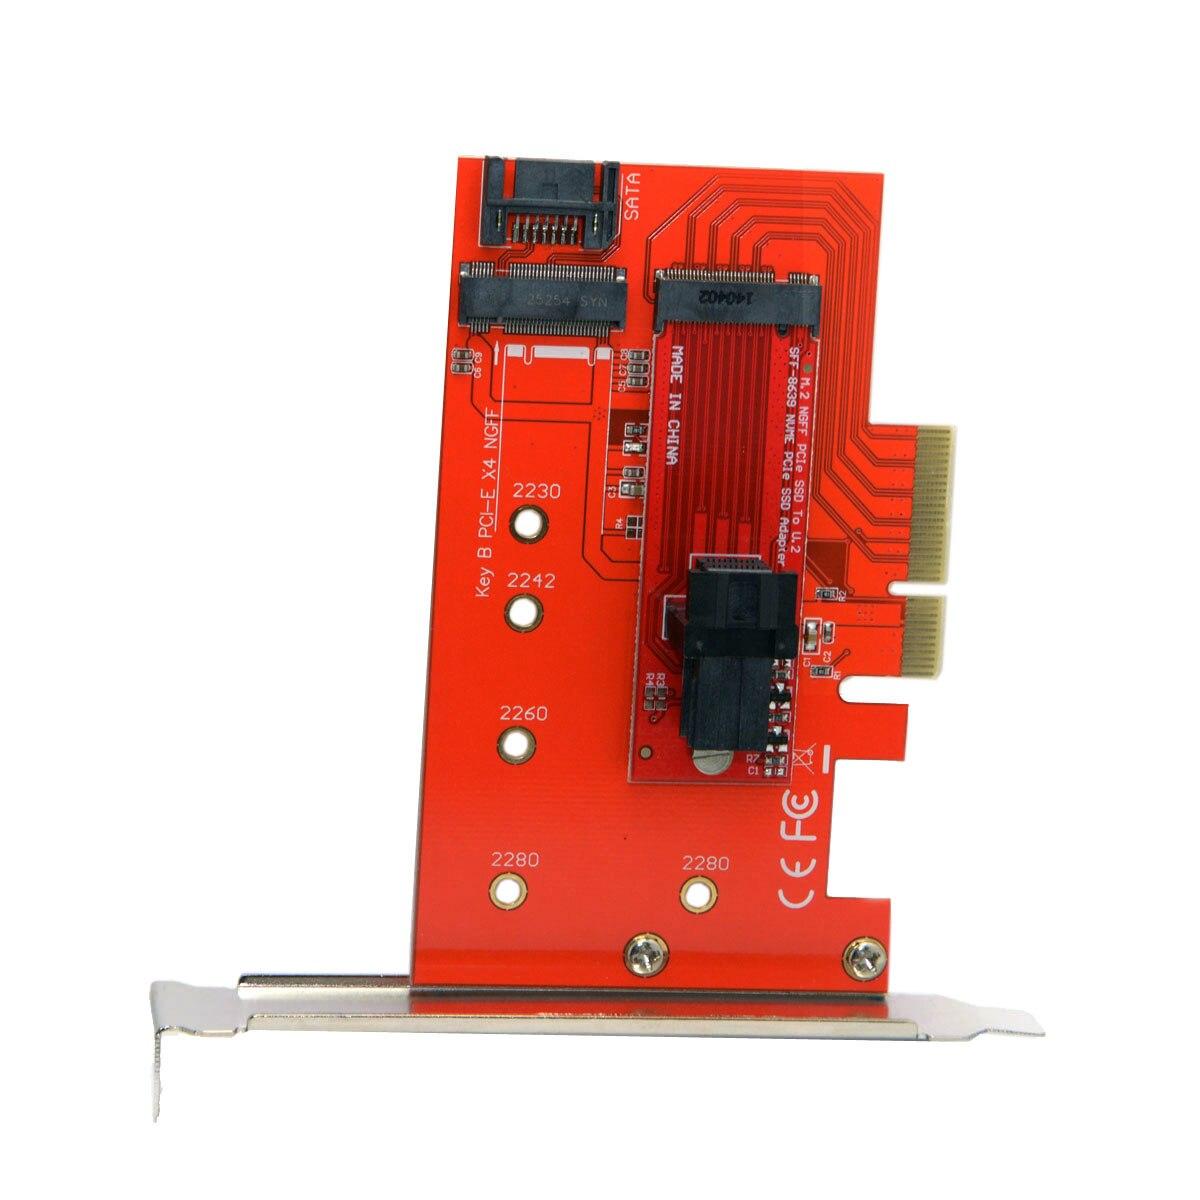 PCI-E 3,0x4 Lane usb-адаптер M.2 NGFF M ключ SSD в U.2 U2 комплект SFF-8639 для Материнская плата Intel SSD 750 p3600 p3700 ...